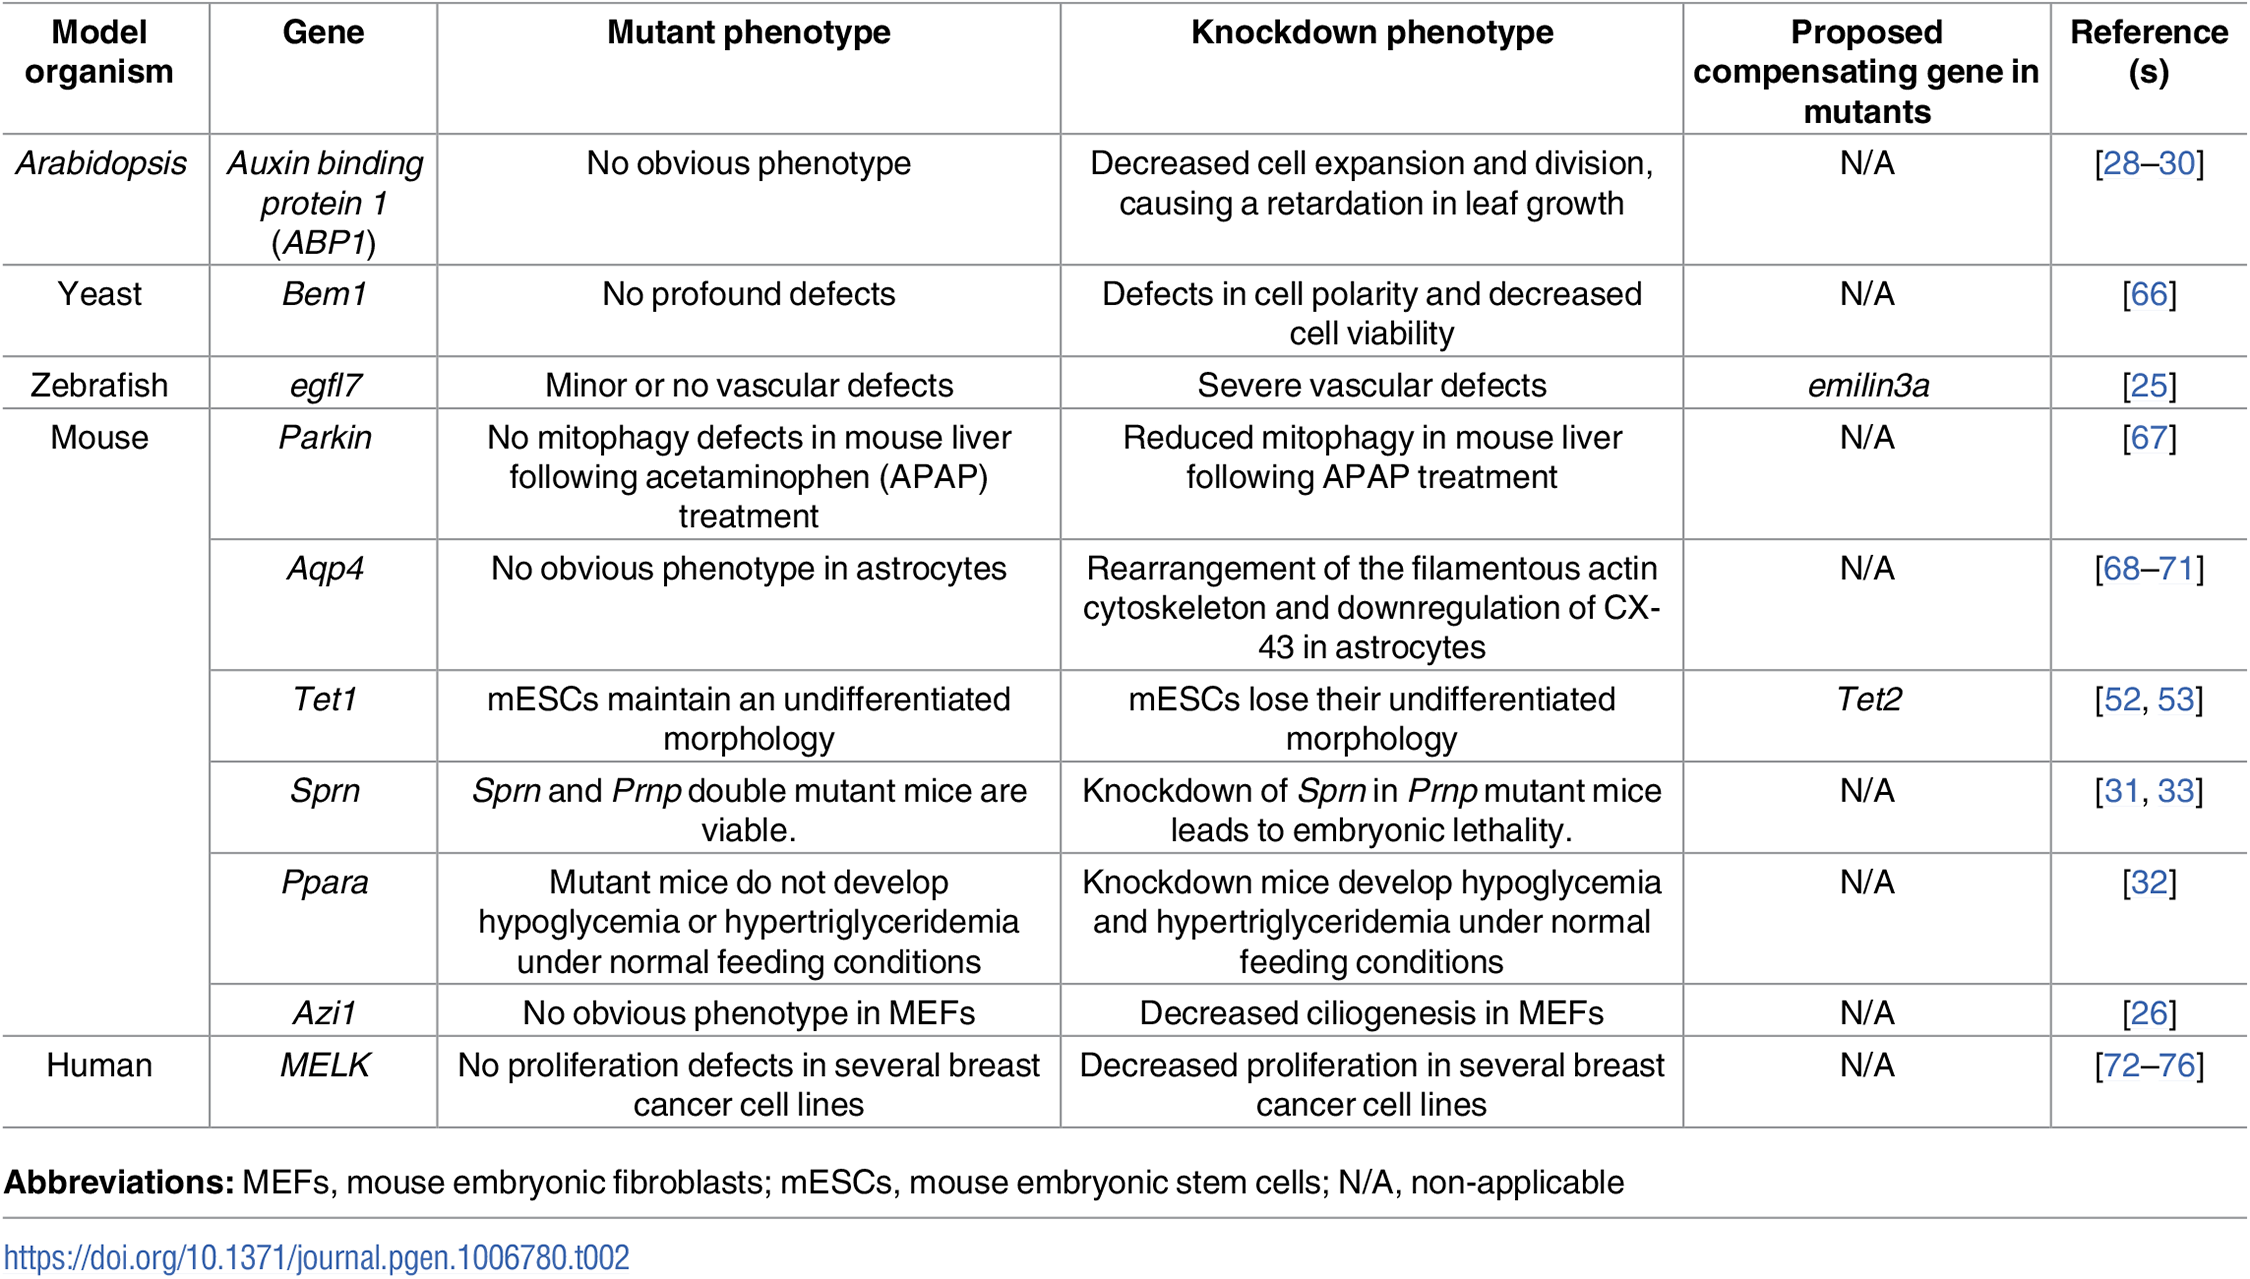 Examples of discrepancies between mutant and knockdown phenotypes.